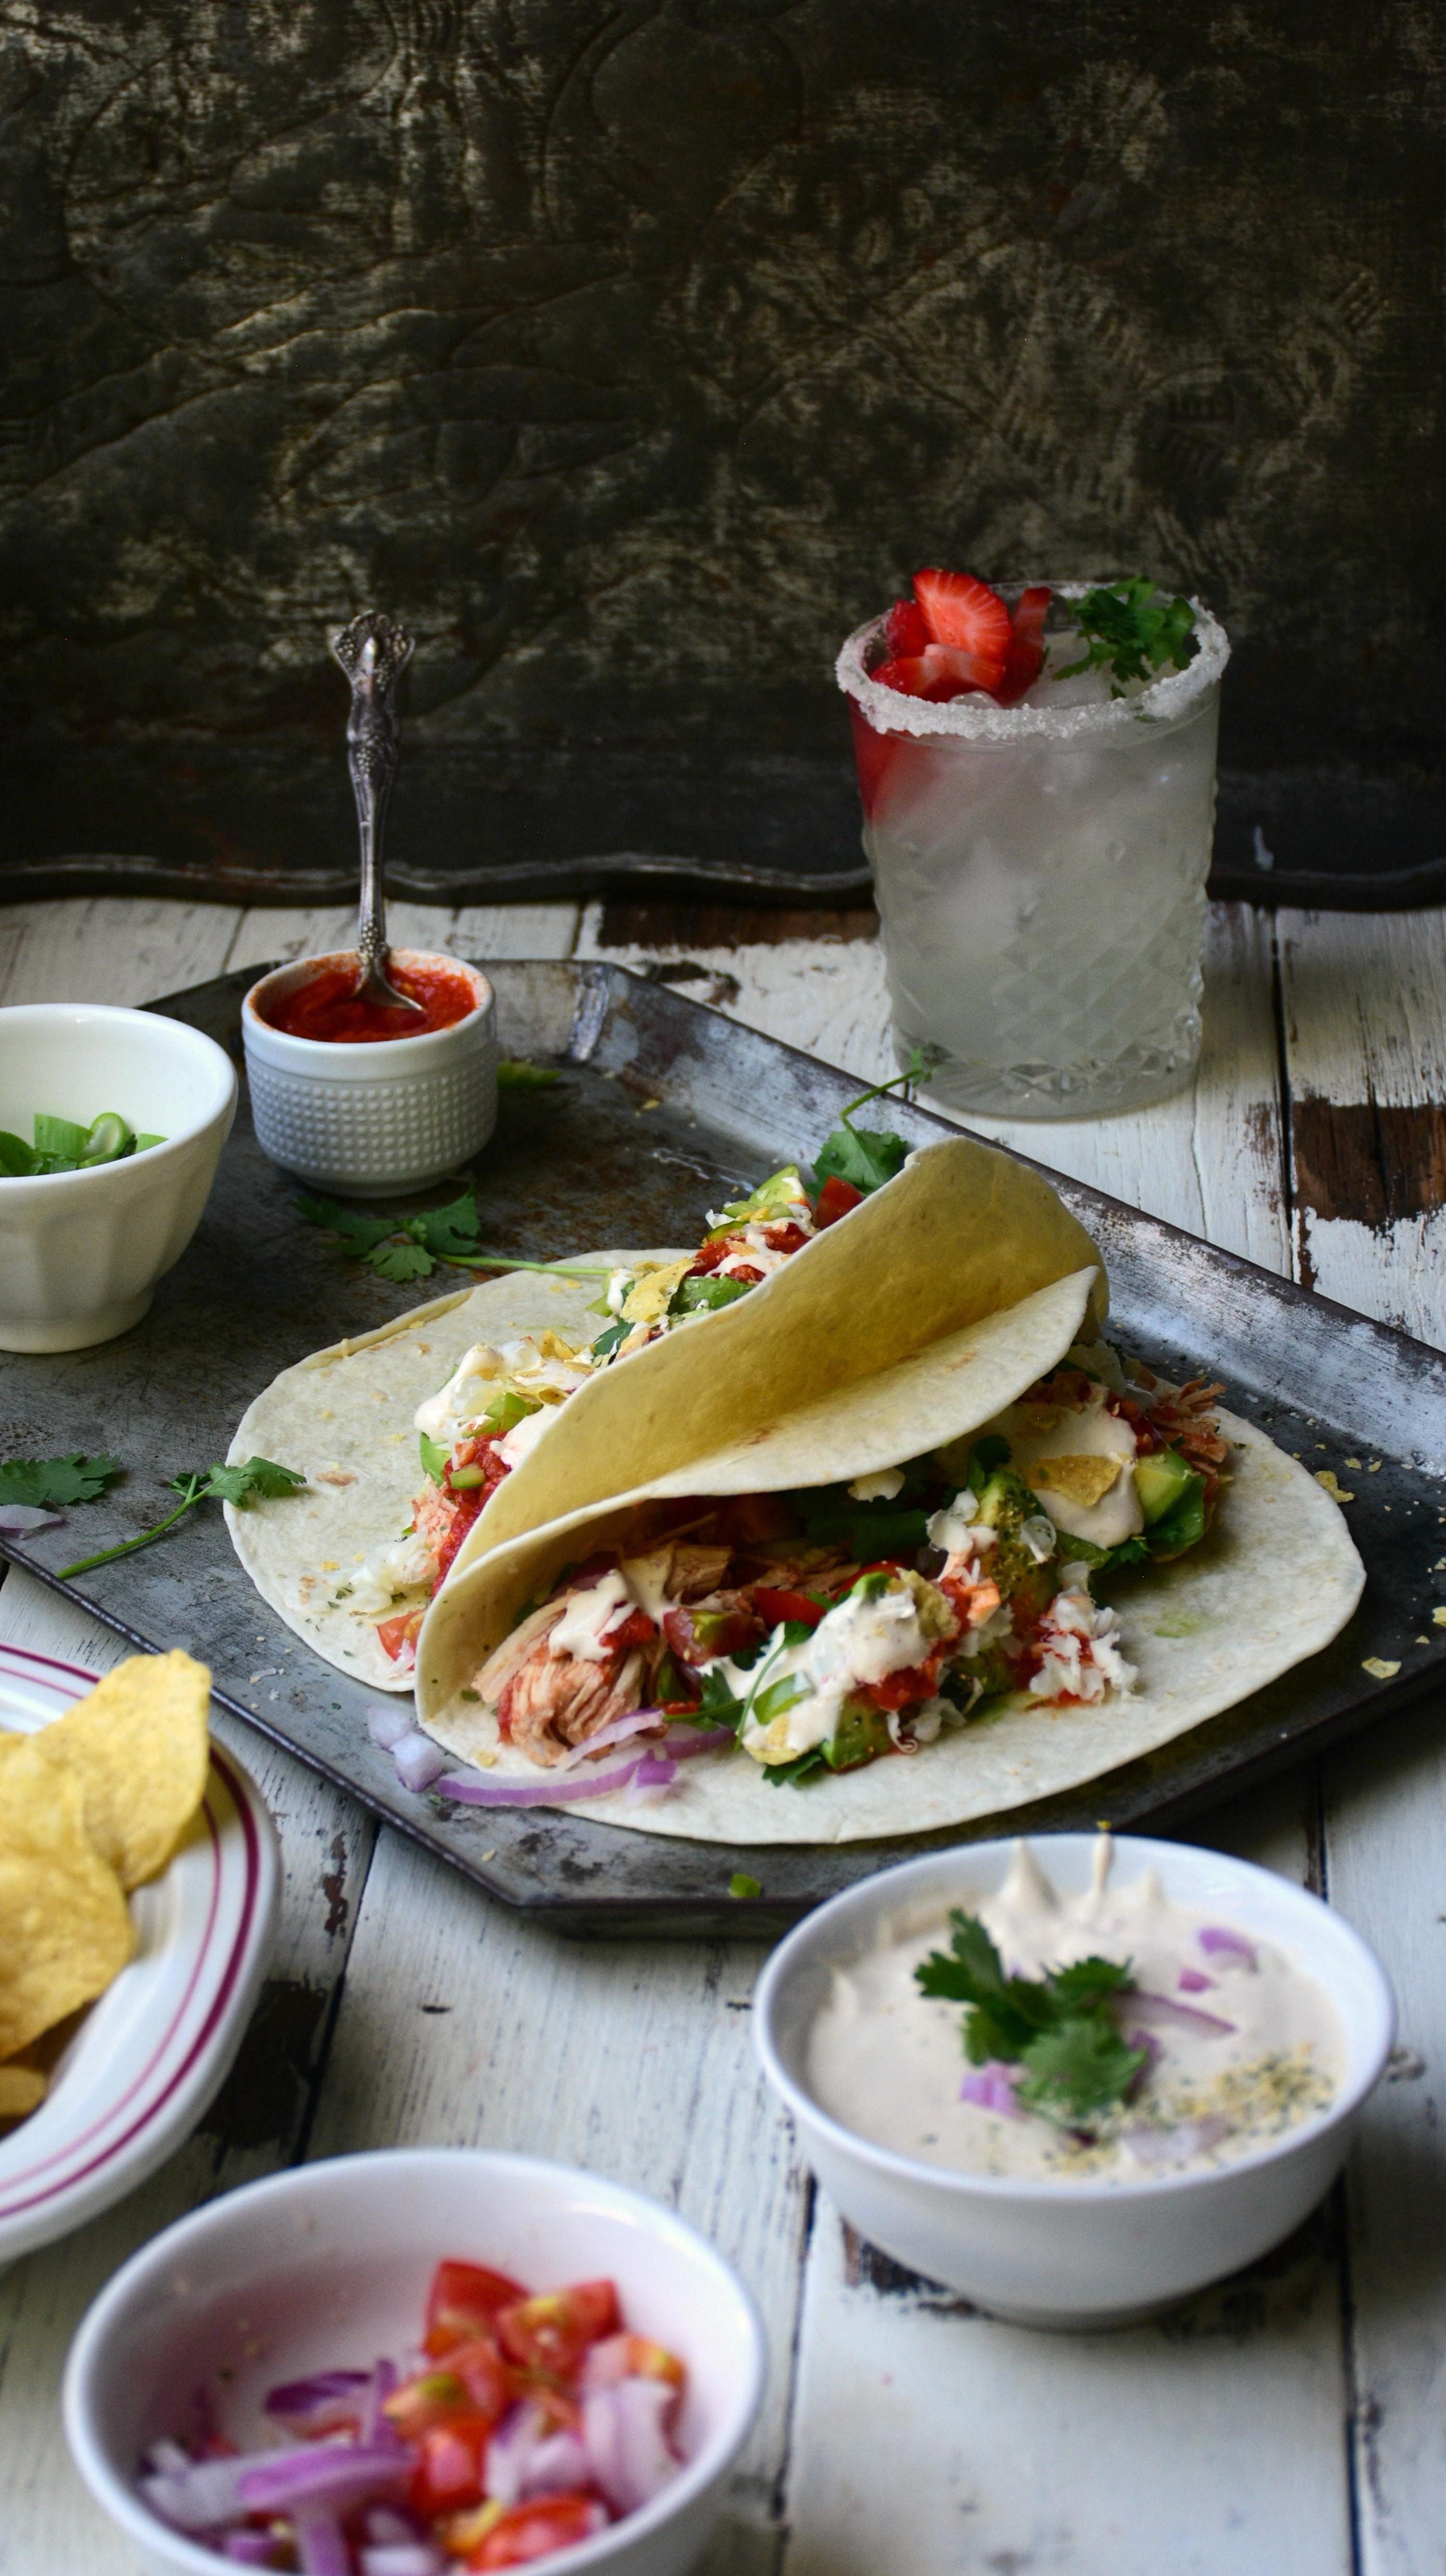 DIY Salsa Chicken Taco Bar | The Realistic Nutritionist